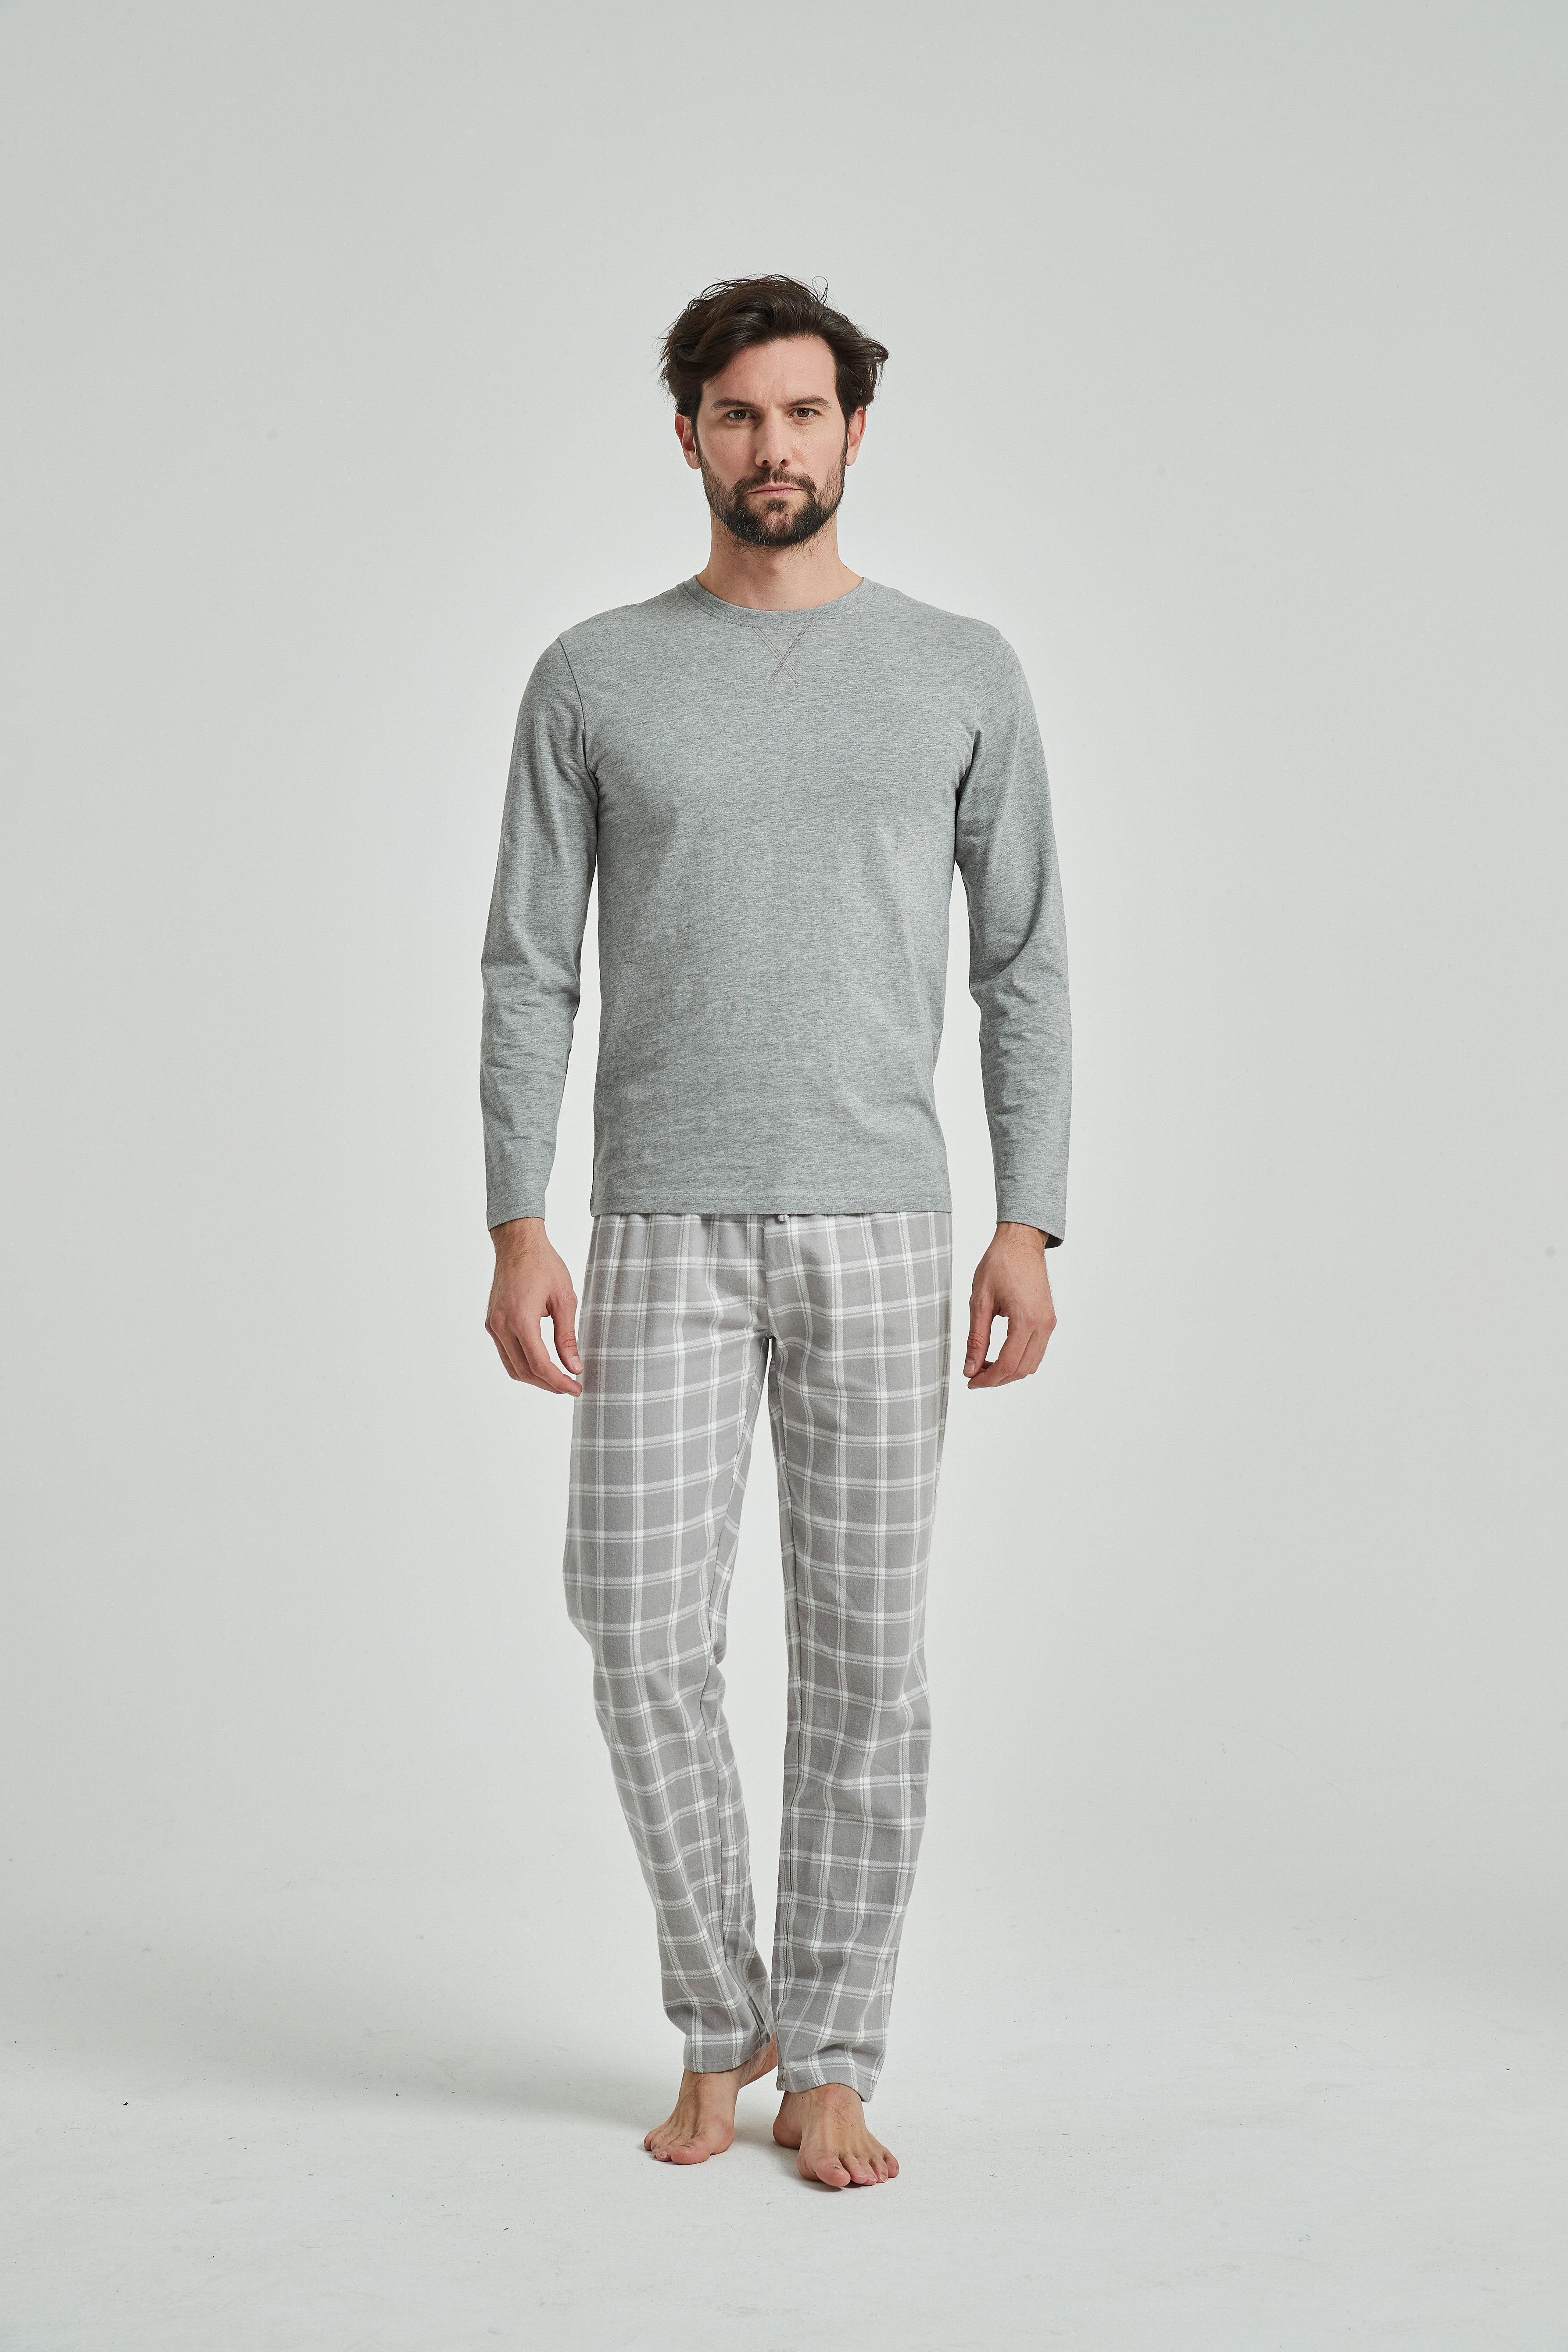 PimpamTex-Man Pajamas Flannel 100% Cotton Long Sleeve And Long Pant-dog